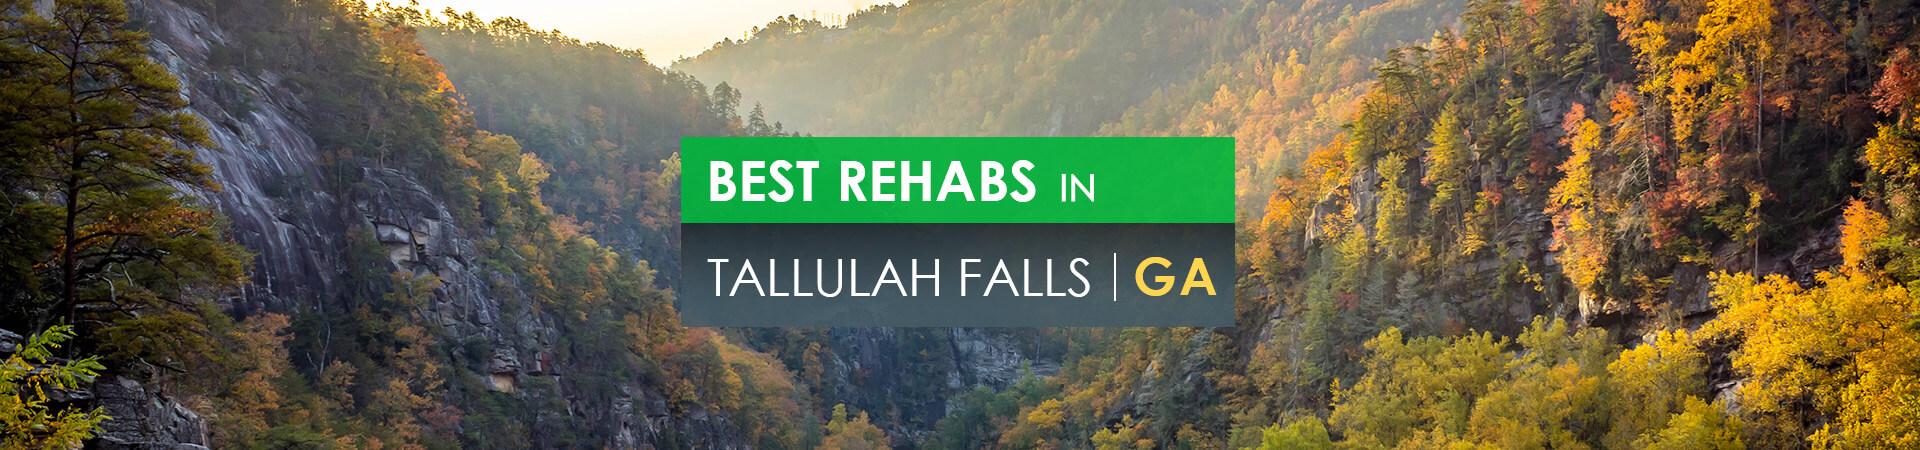 Best rehabs in Tallulah Falls, GA